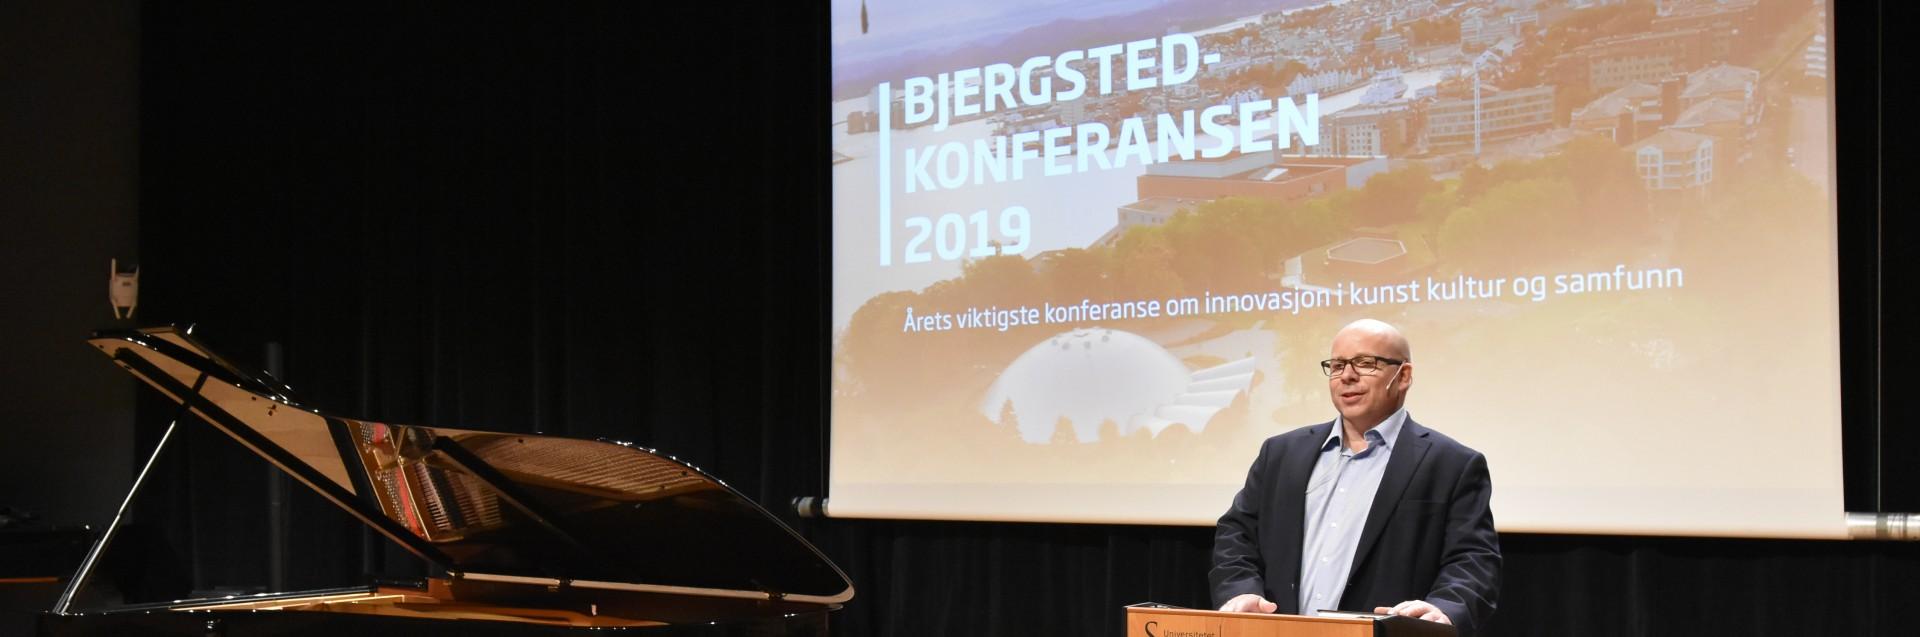 Bjergsted-konferansen 2019